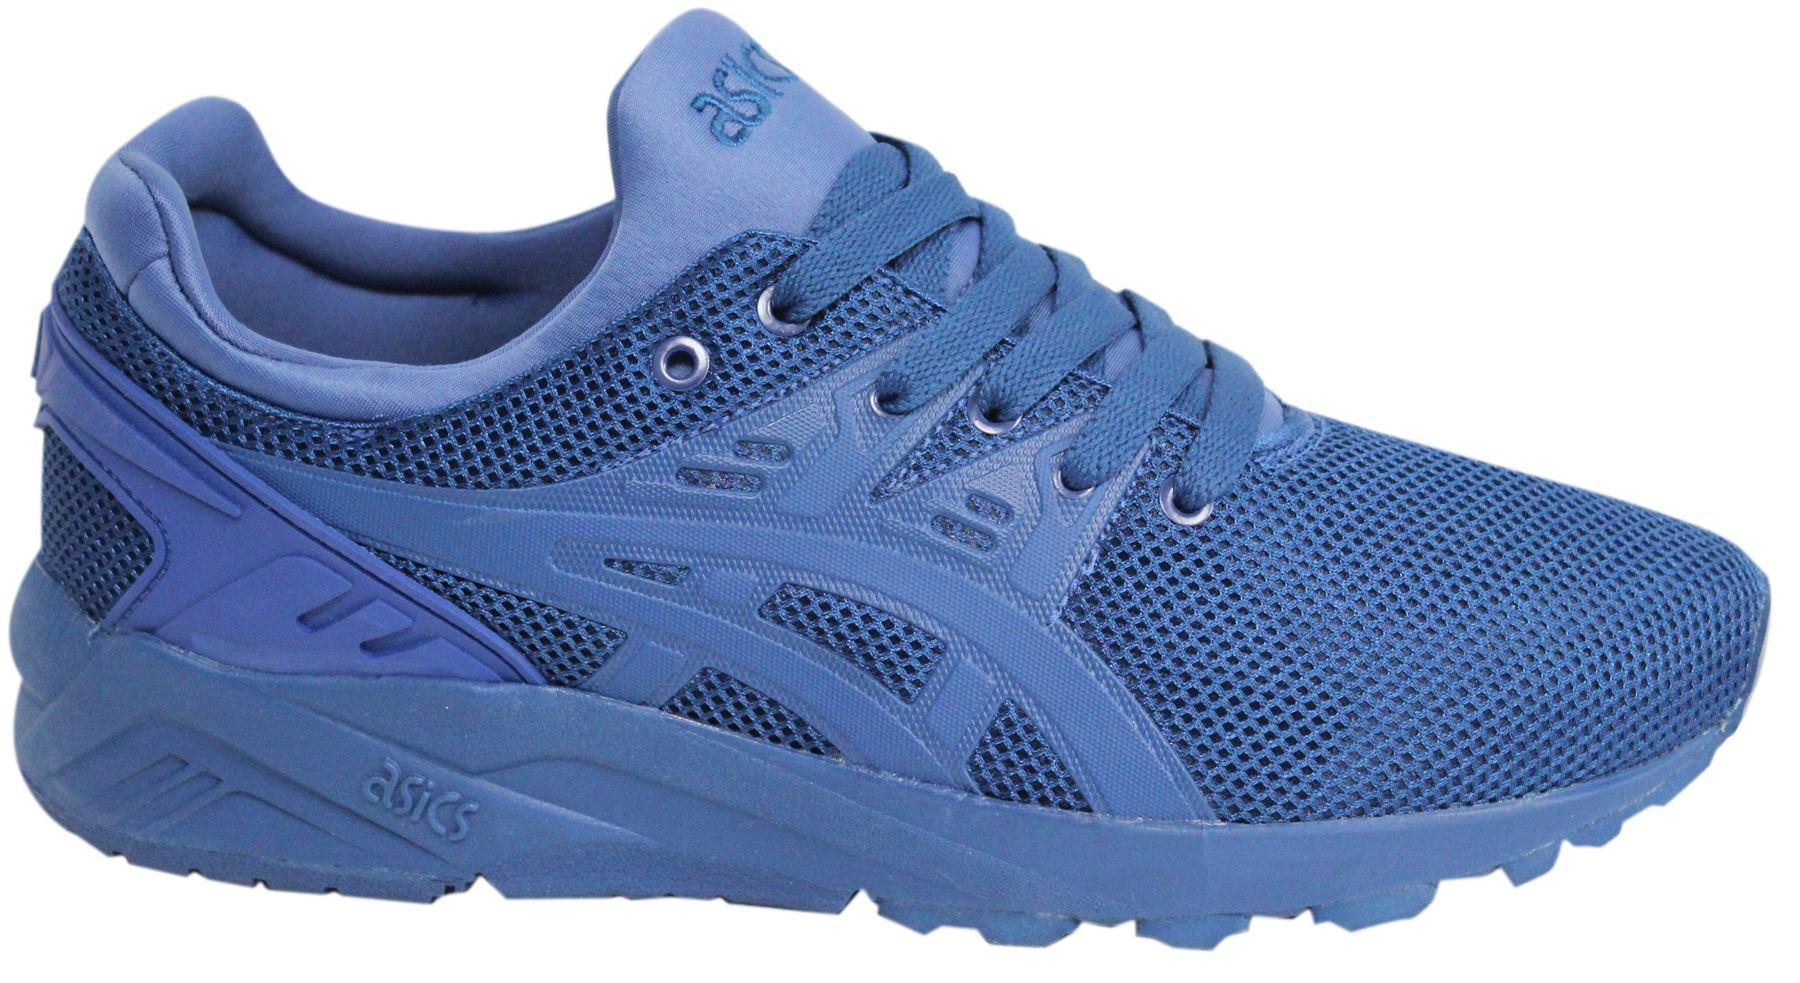 best website bc949 5b4ff Details about Asics Gel-Kayano Evo Lace Up Monaco Blue Mens Textile  Trainers H62SQ 4242 M15